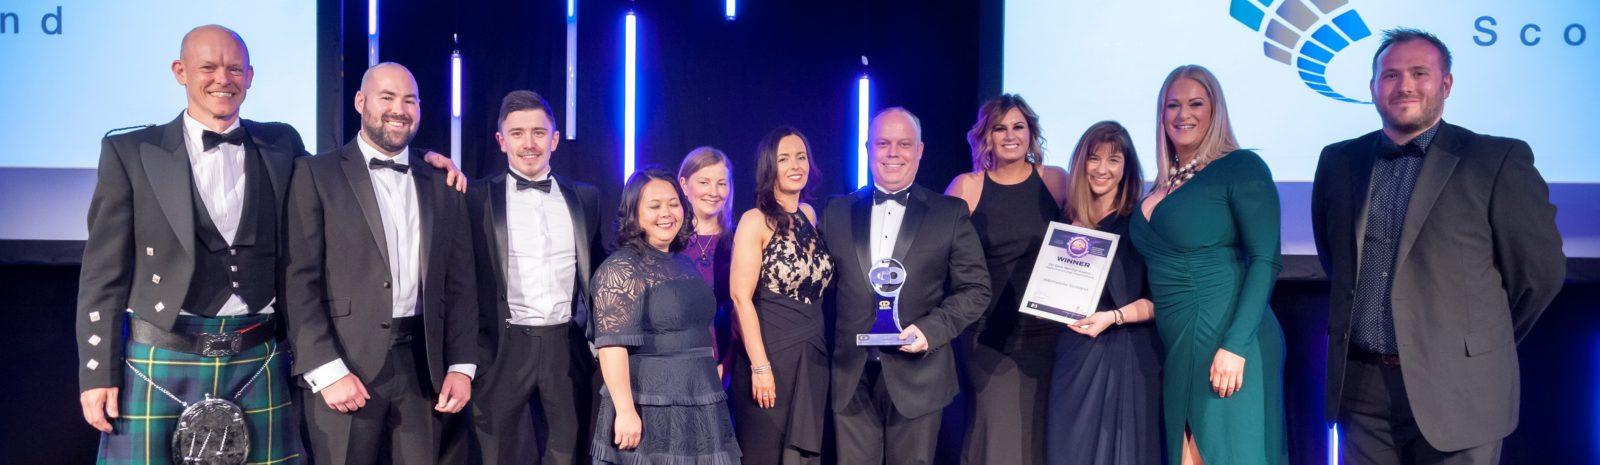 Warmworks Scotland team at GO Awards